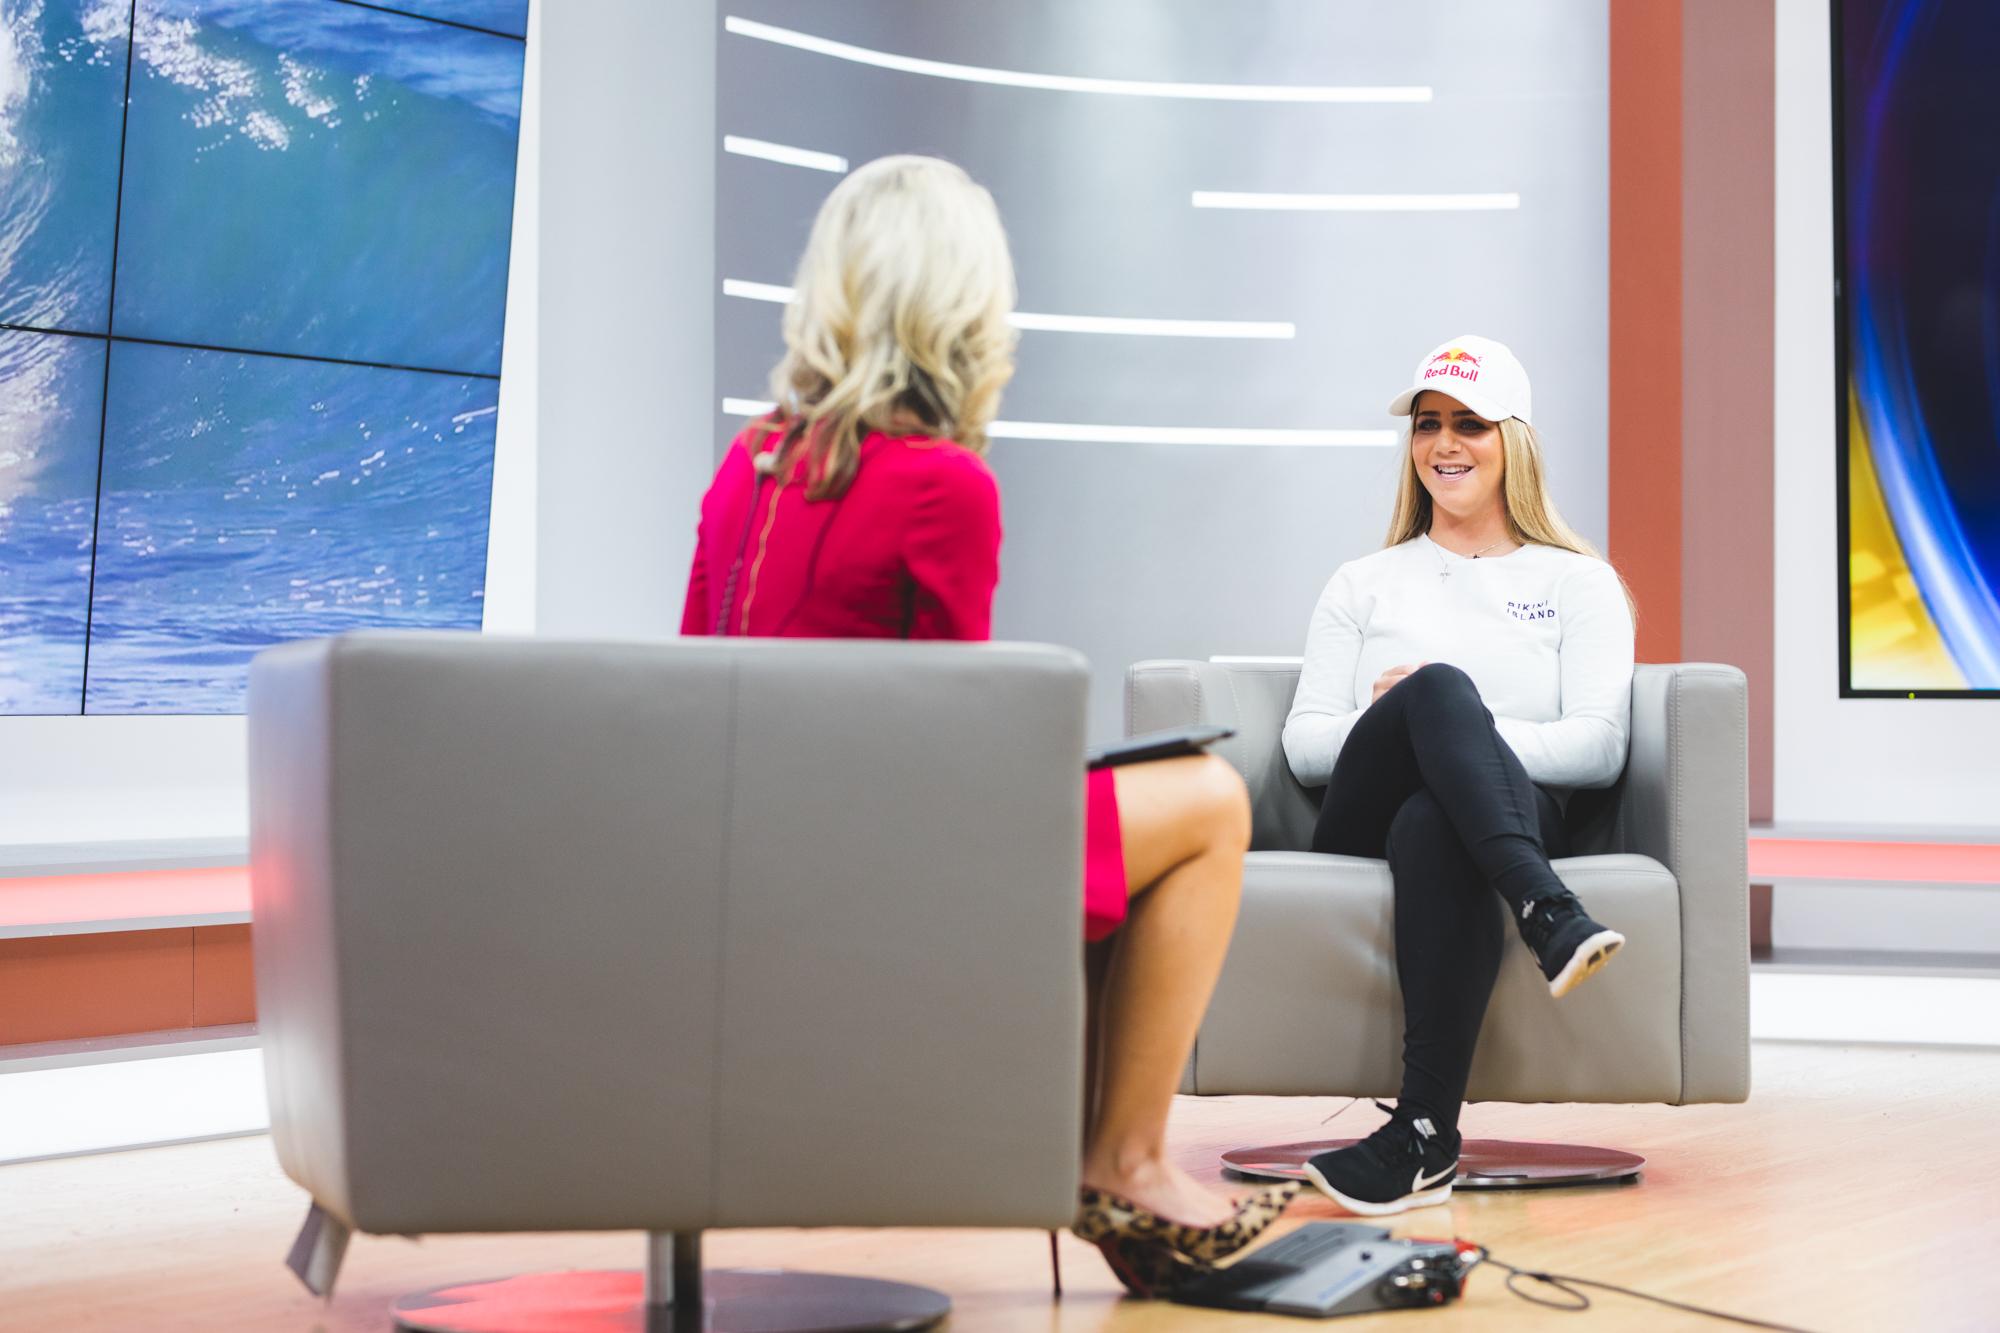 Caroline Marks on the morning talk show with Amy Kaufeldt, co-host of Good Day Orlando.